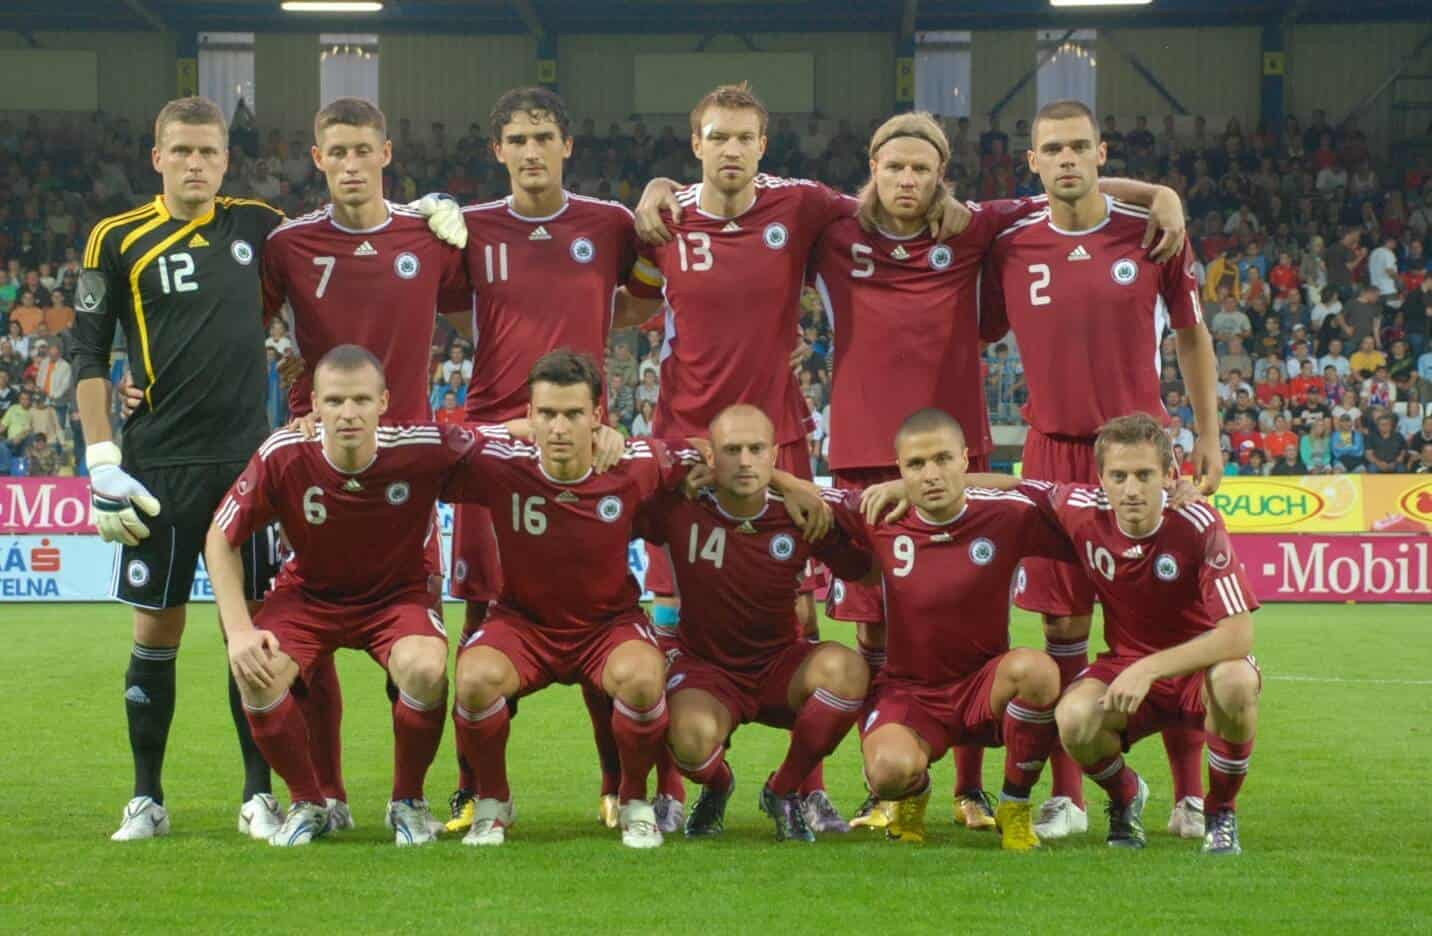 latvia fc soccer team 2019